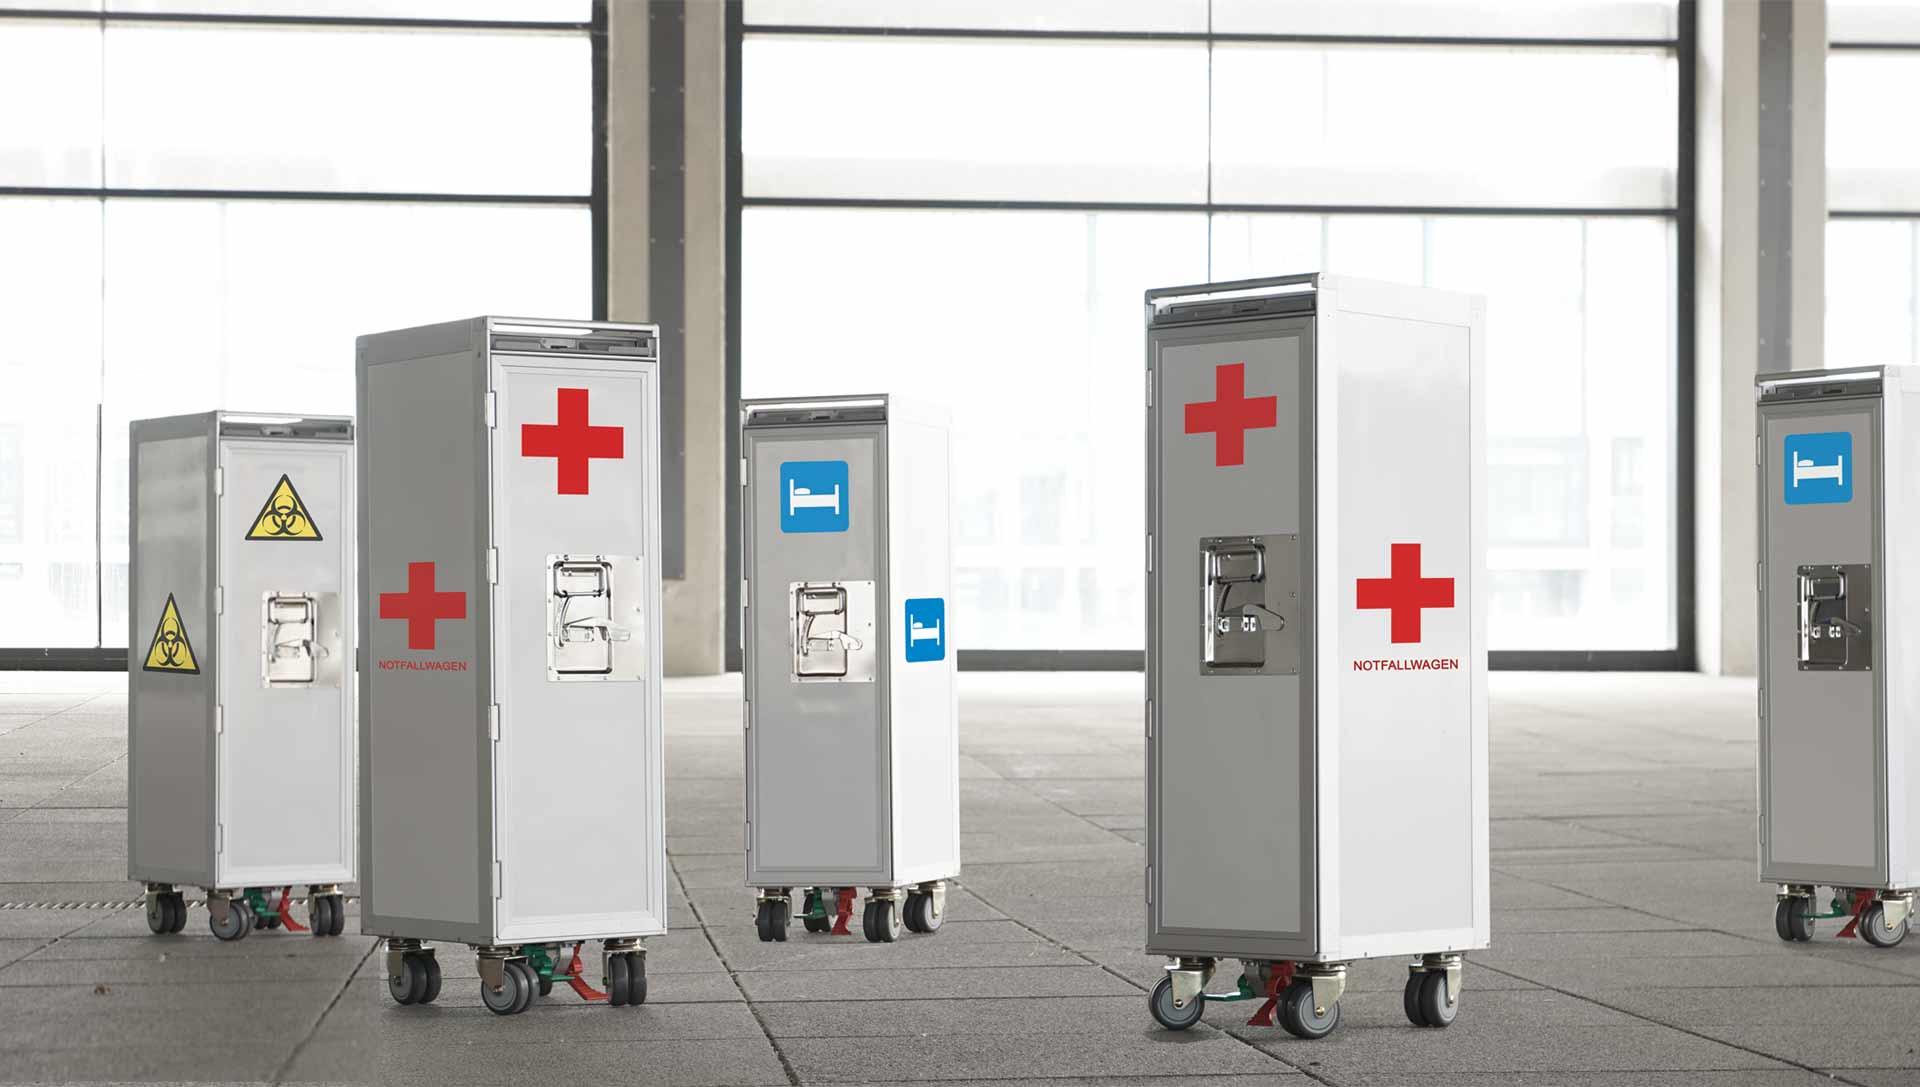 Flugzeugtrolleys als Notfallwagen Bettenwagen in der Medizin